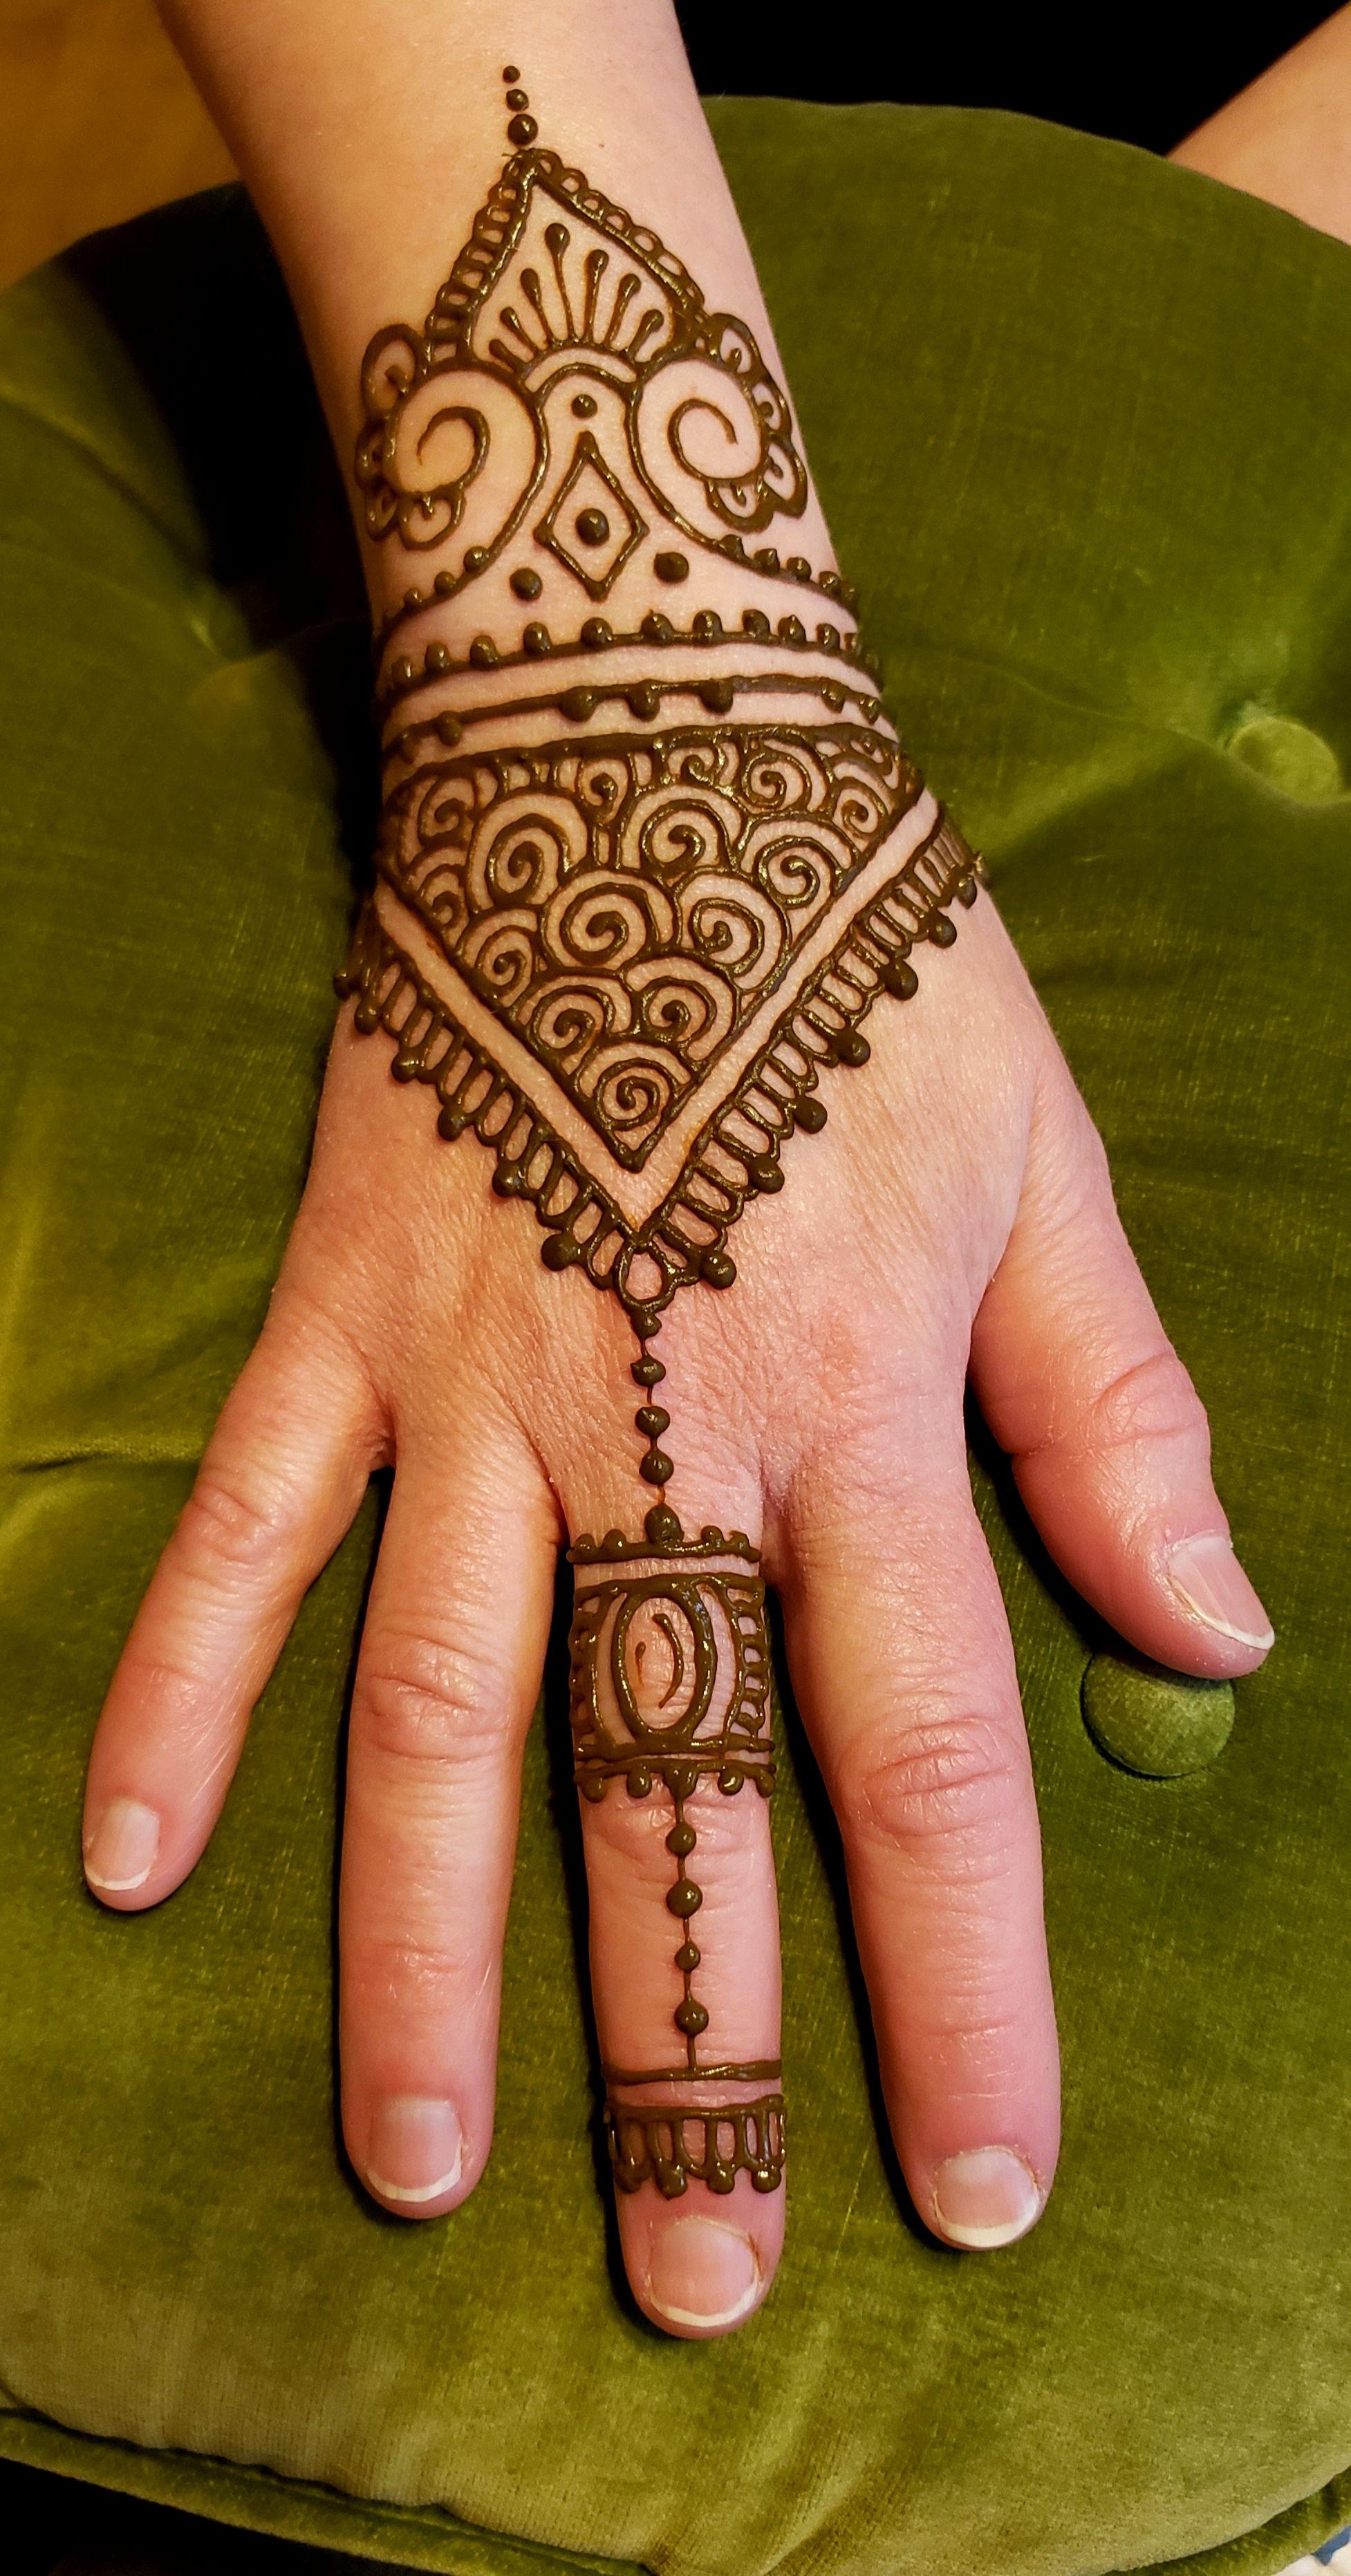 Henna Tattoos Mehndi Luna Henna Tattoo Artist Near Me In 2020 Henna Shop Henna Tattoo Tattoo Artists Near Me